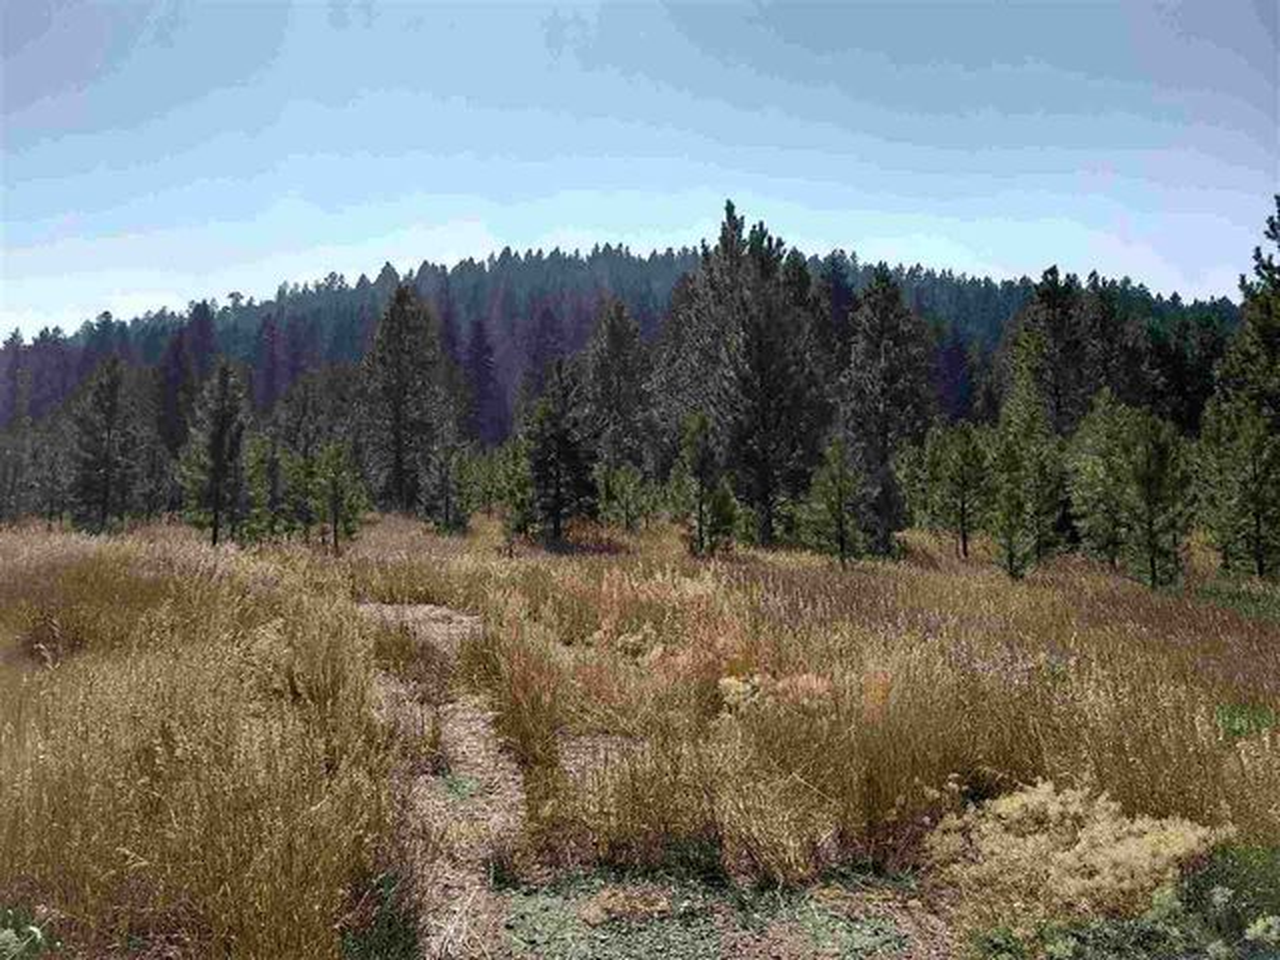 197 S. Hills Road, Montana City, MT 59634